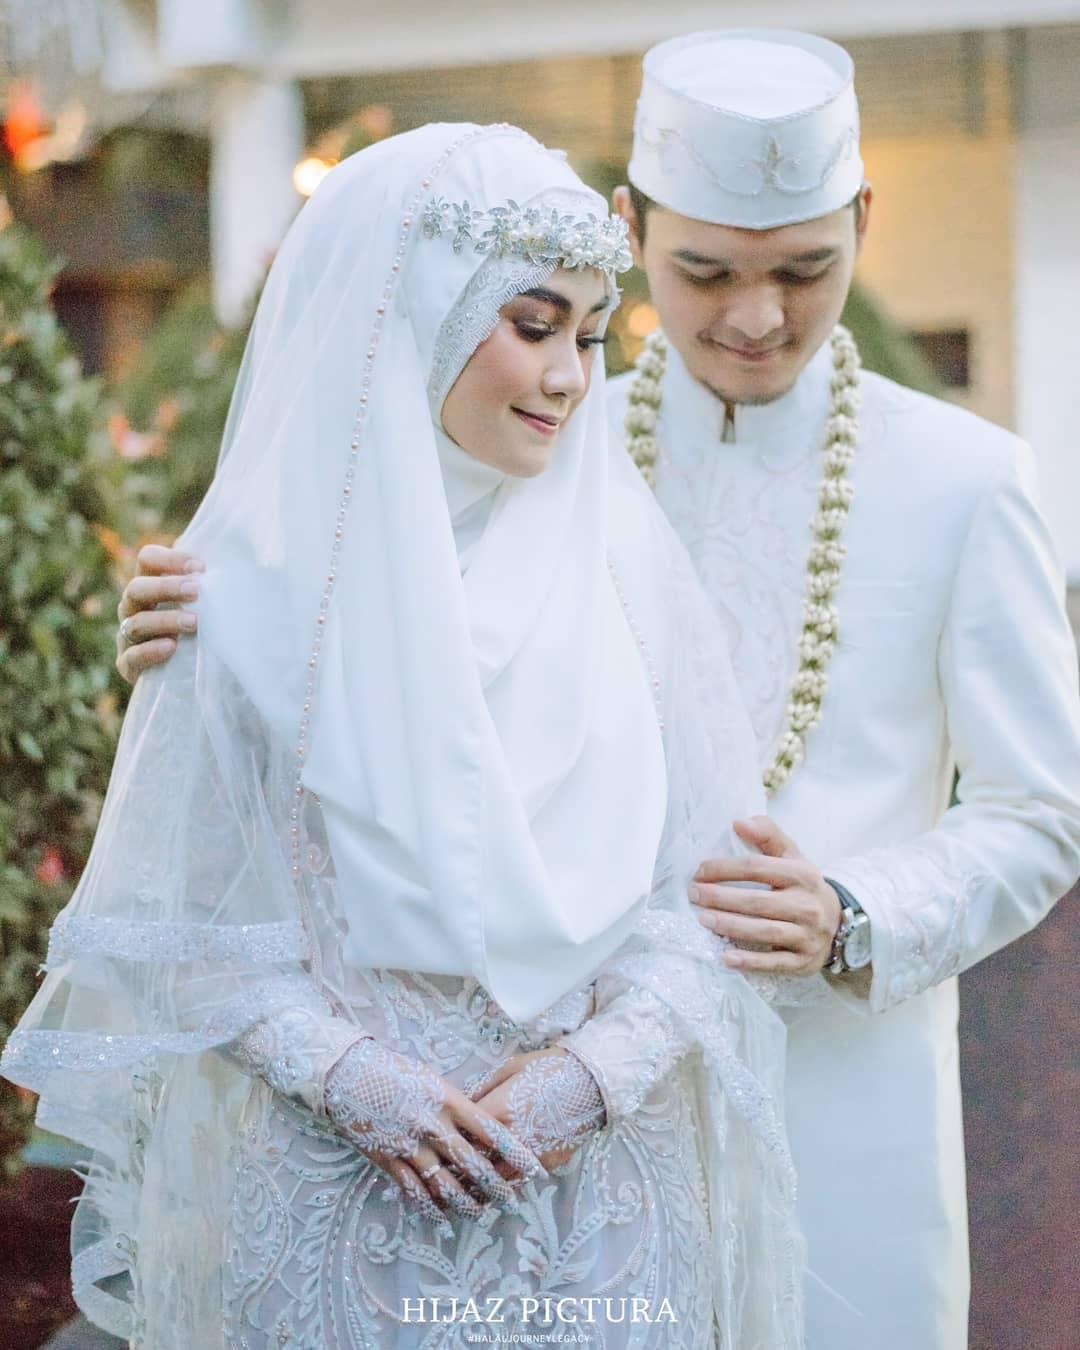 Baju Pengantin Muslimah Sederhana